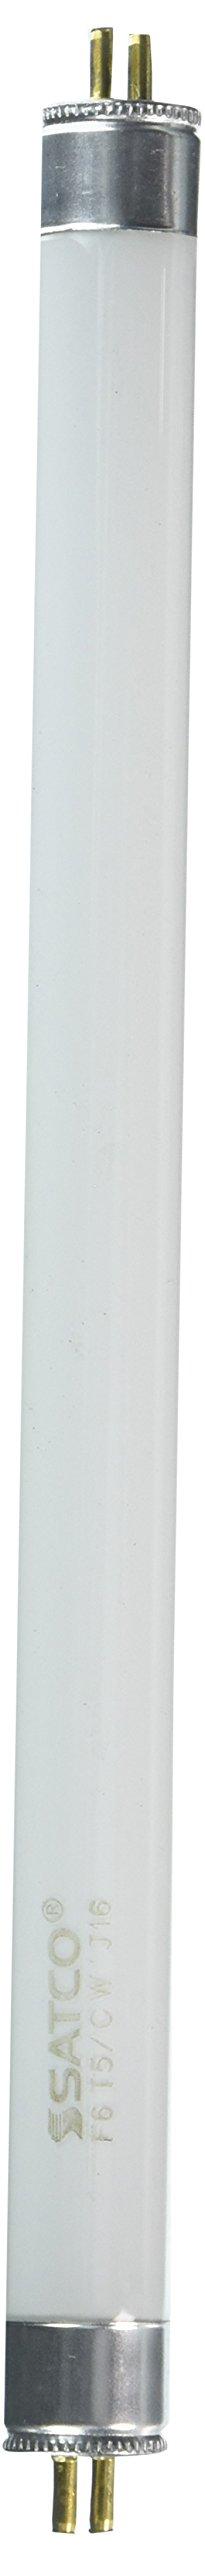 Satco S1902 4100K 6-Watt Mini Bi Pin T5 Preheat Lamp, Cool White